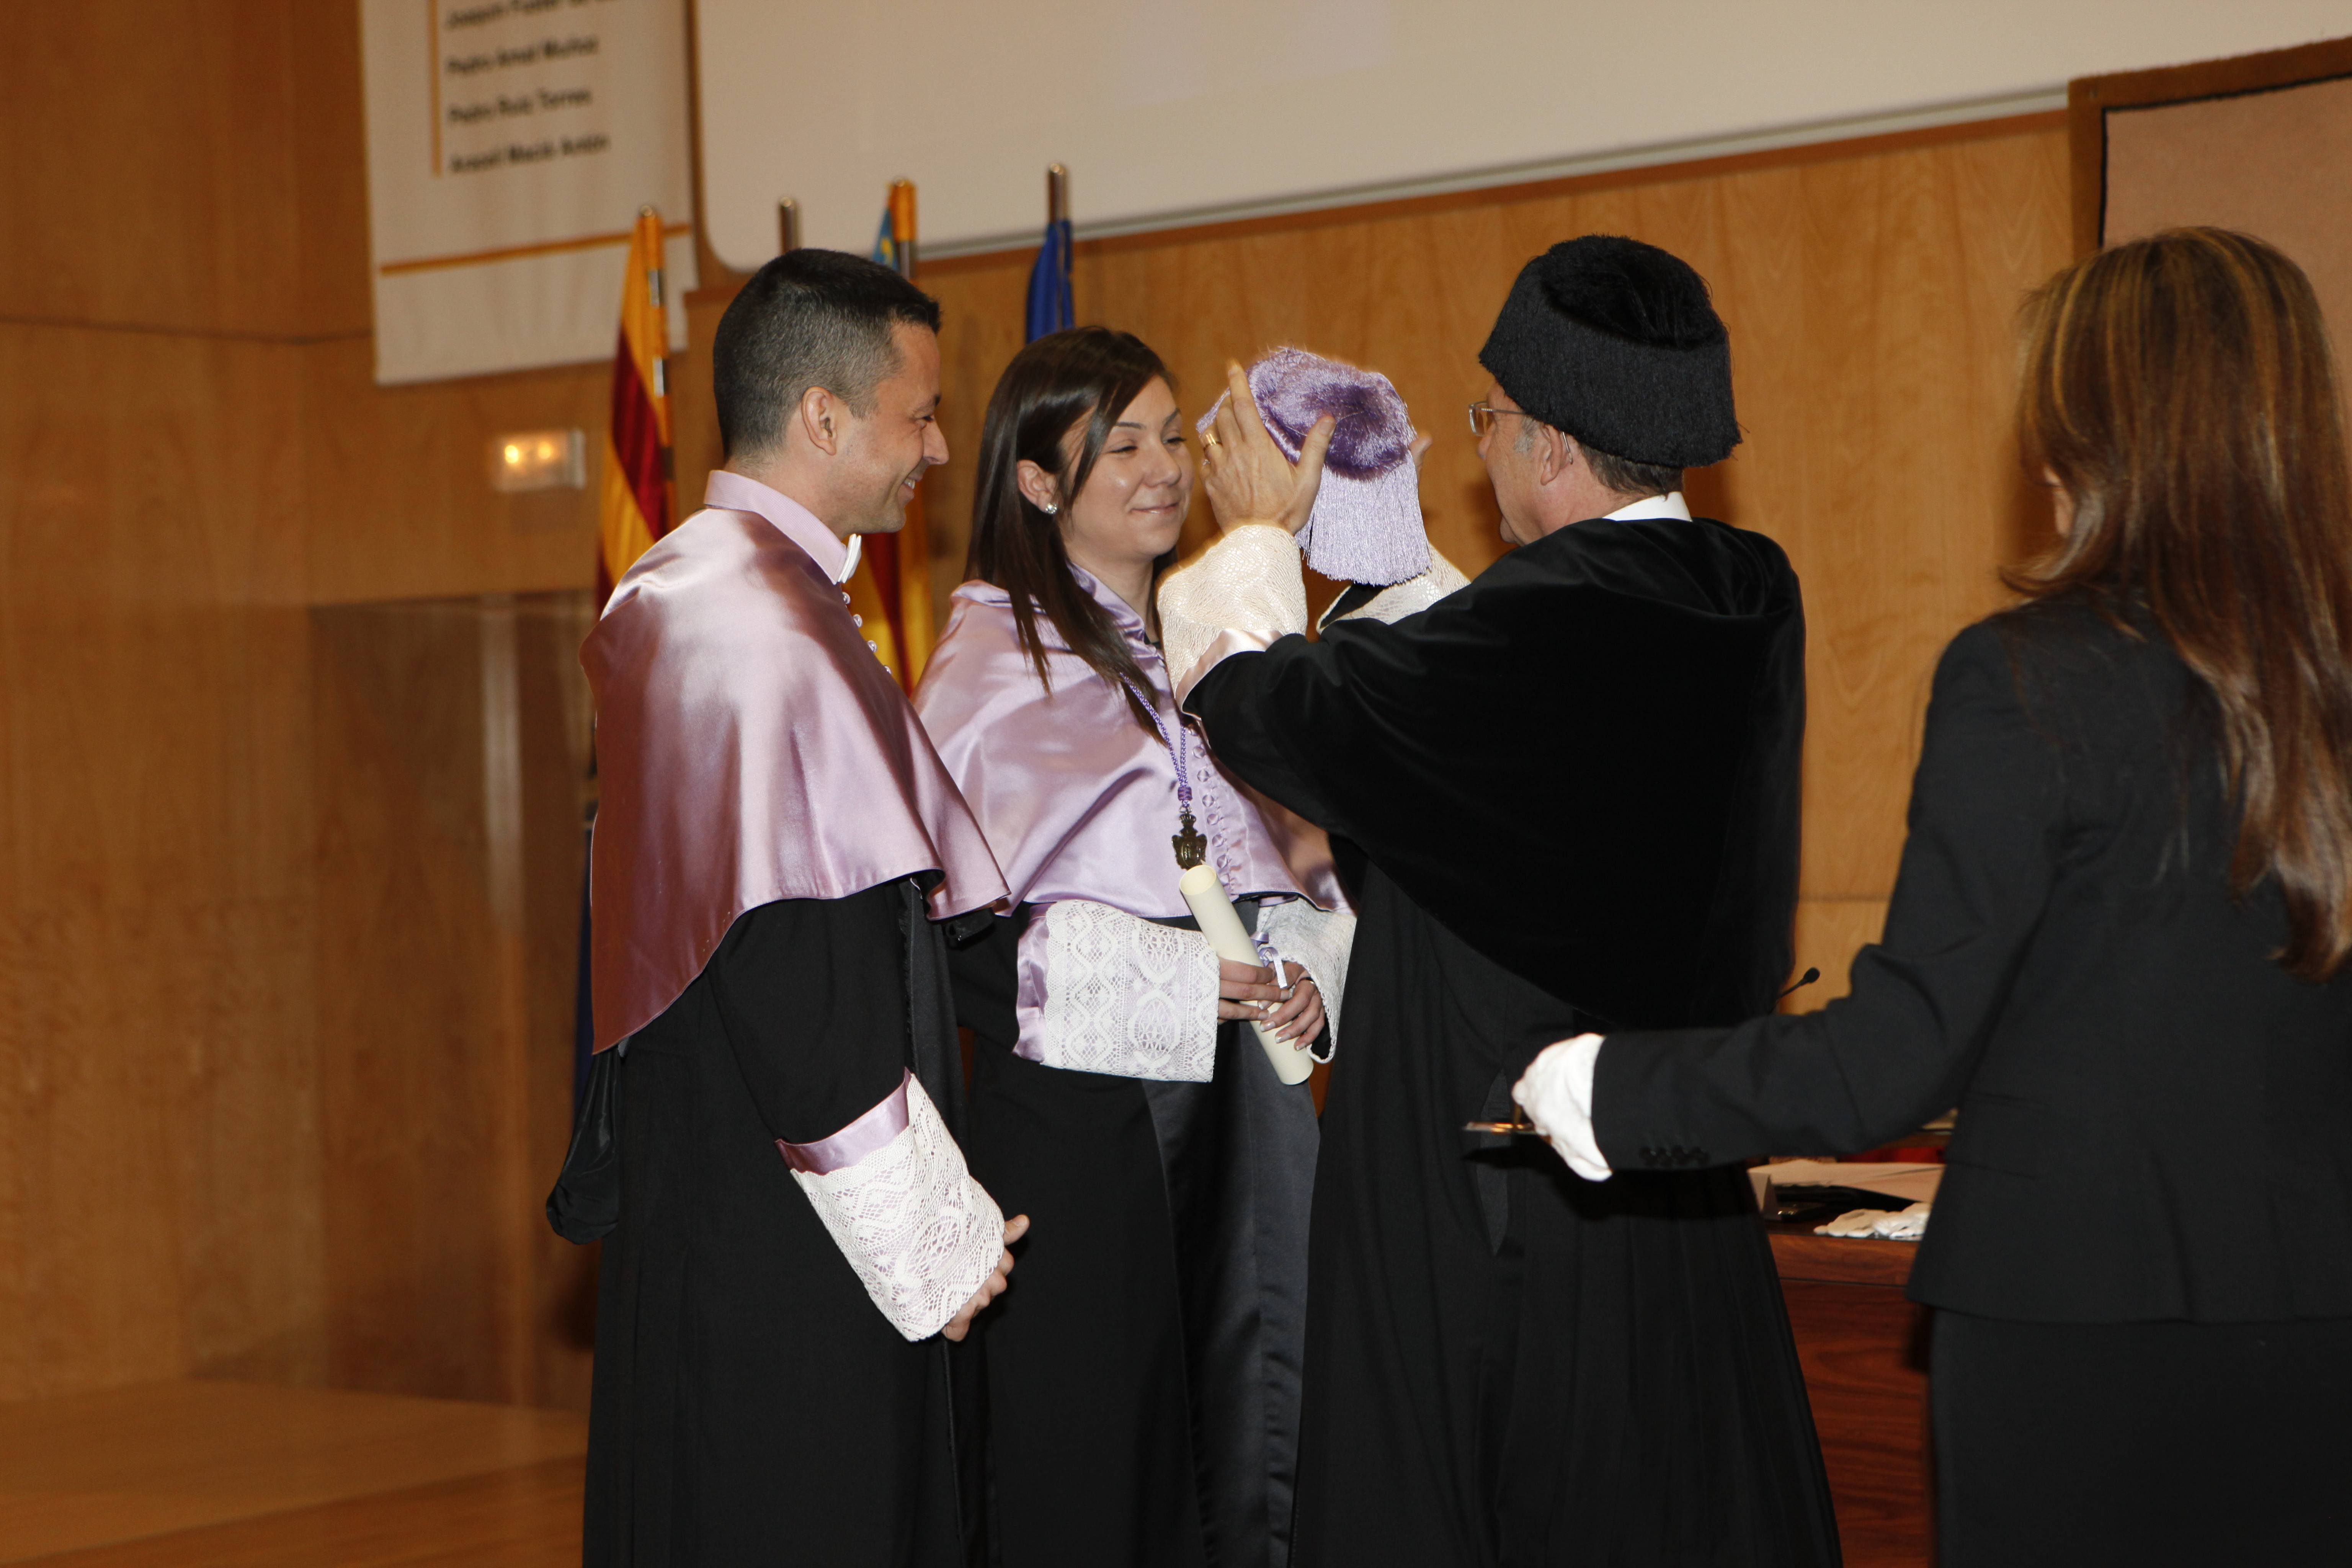 doctor-honoris-causa-luis-gamir_mg_1164.jpg